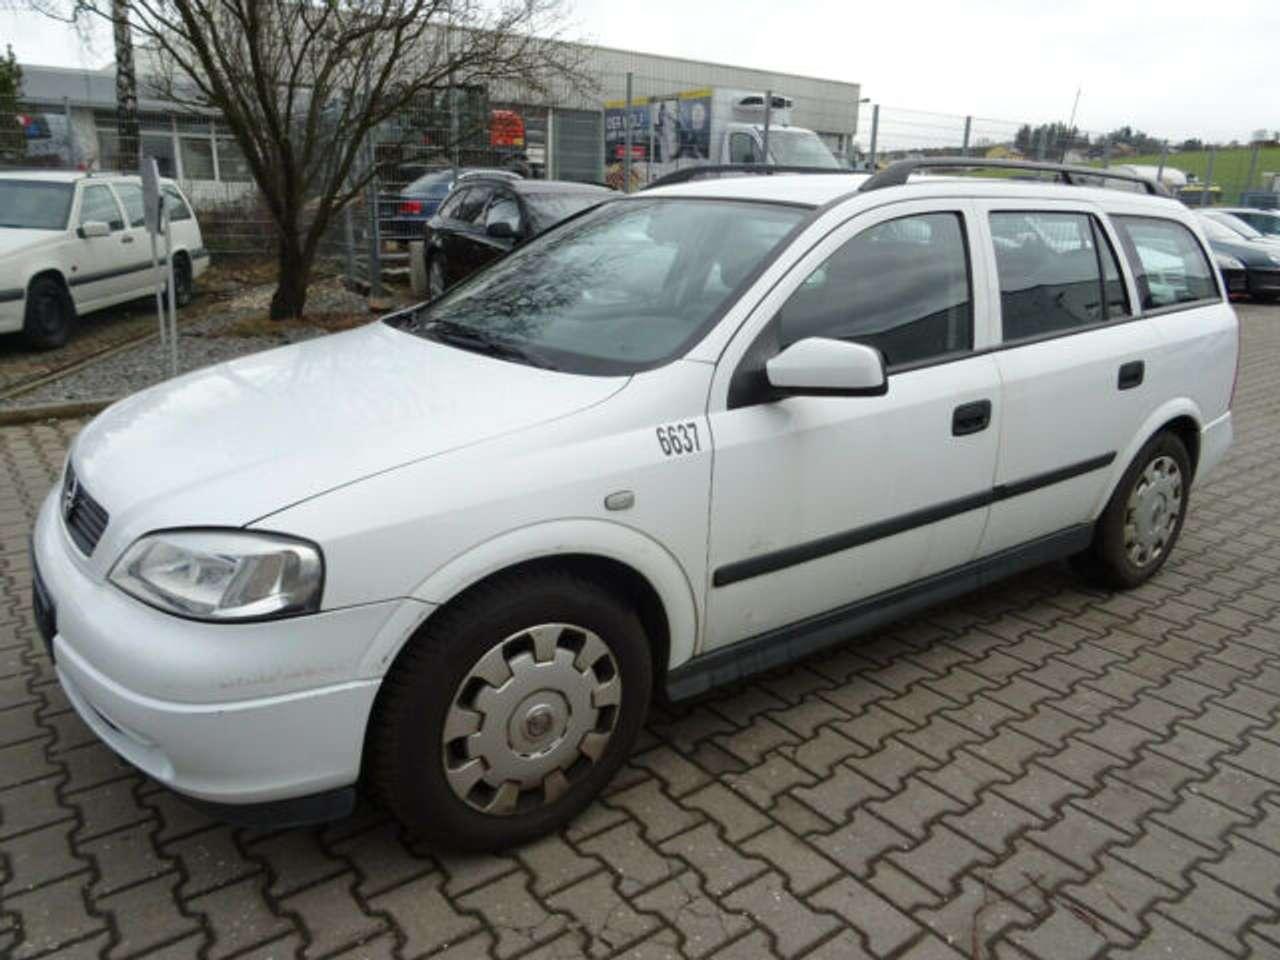 Autos nach Opel Astra Caravan 1.6 CNG 16V